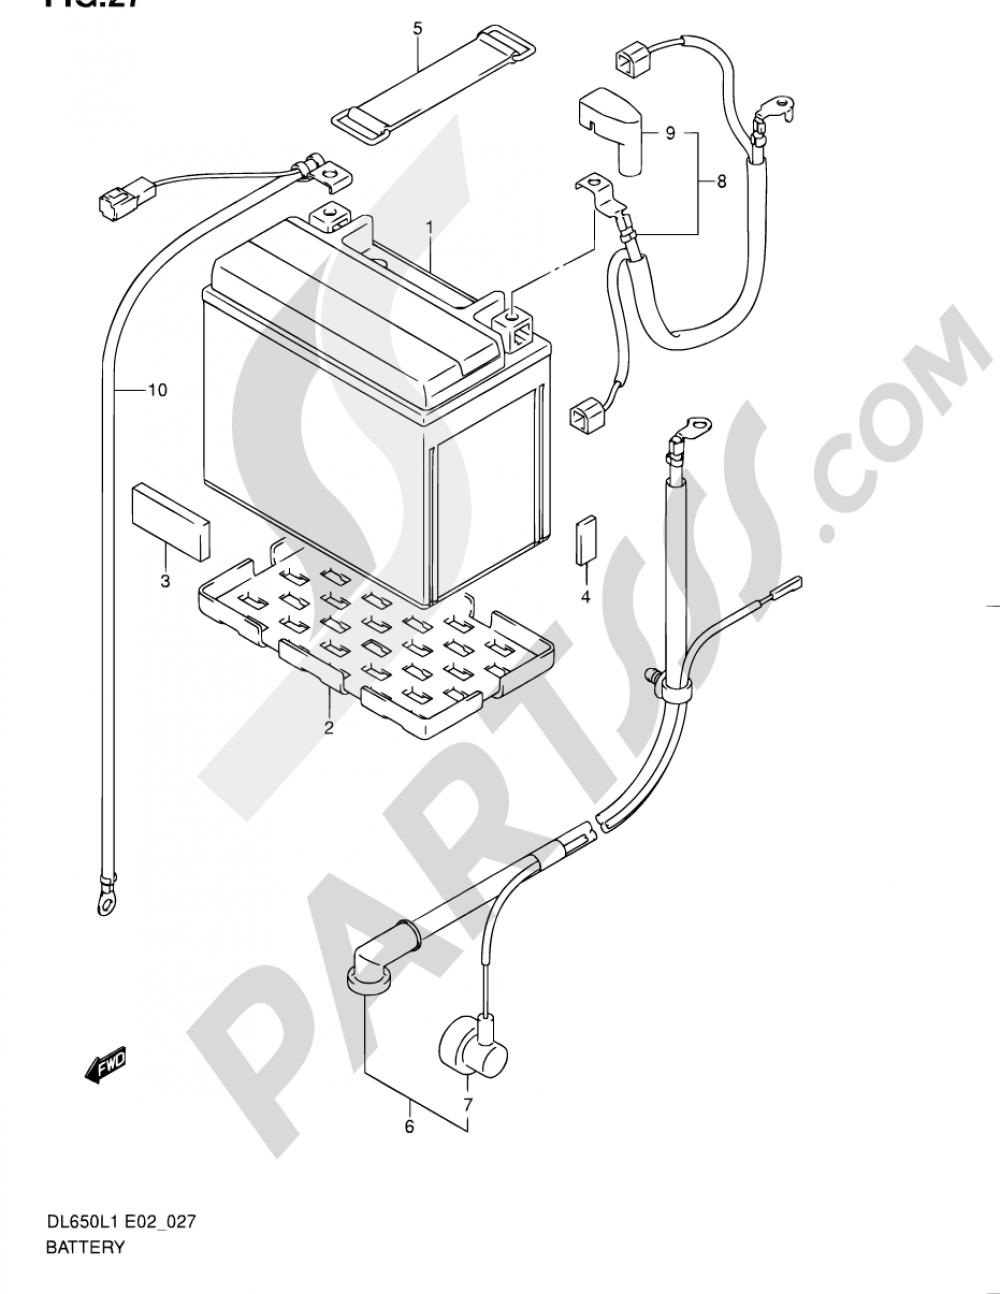 27 - BATTERY (DL650L1 E02) Suzuki VSTROM DL650A 2011